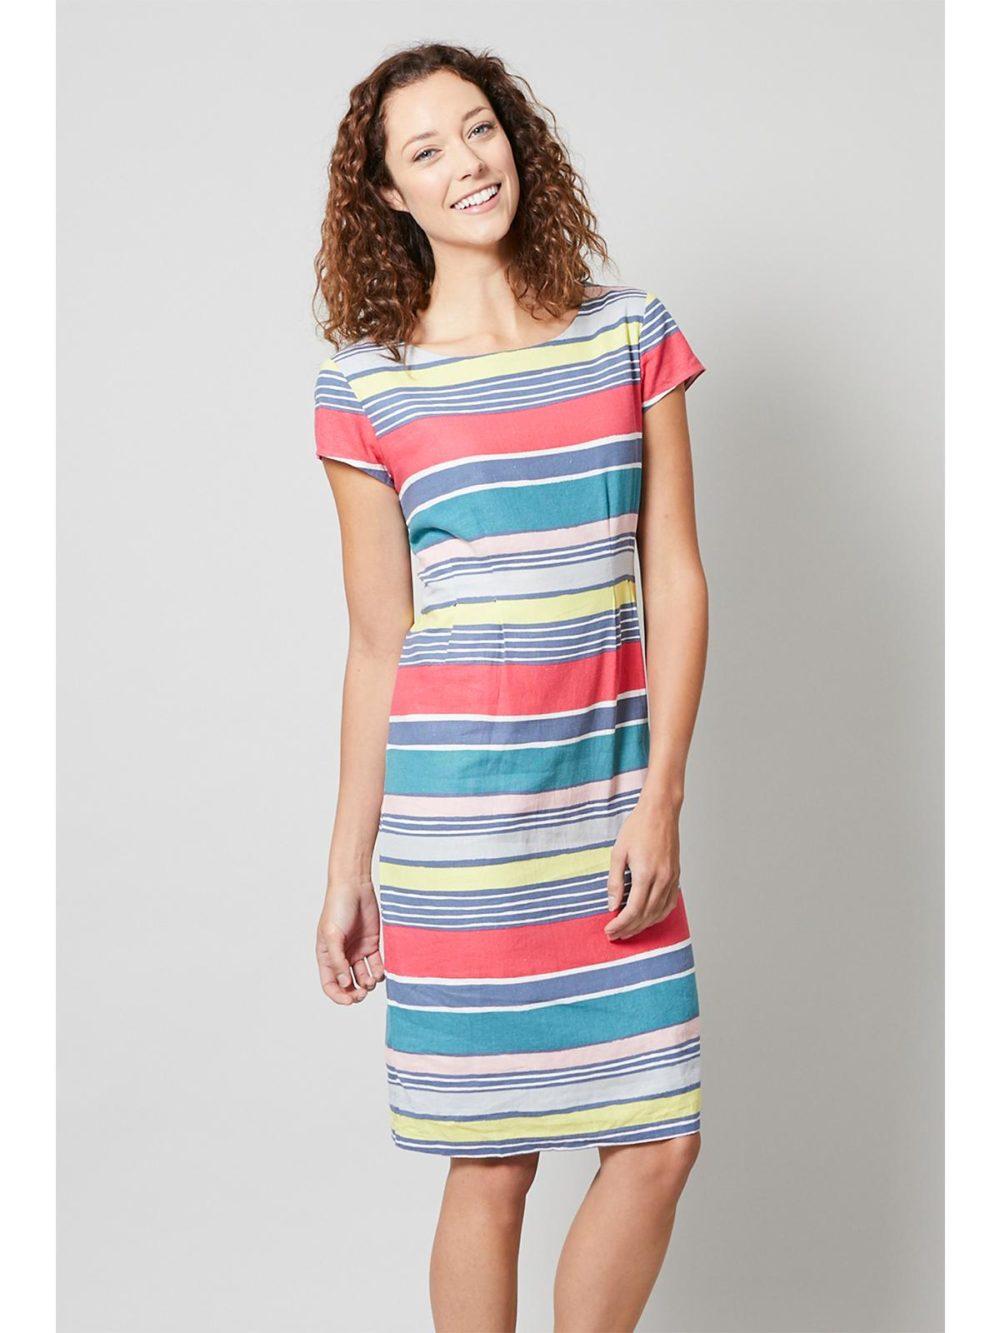 Sandy Bay Dress Stripe Lily and Me Katie Kerr Women's Clothing